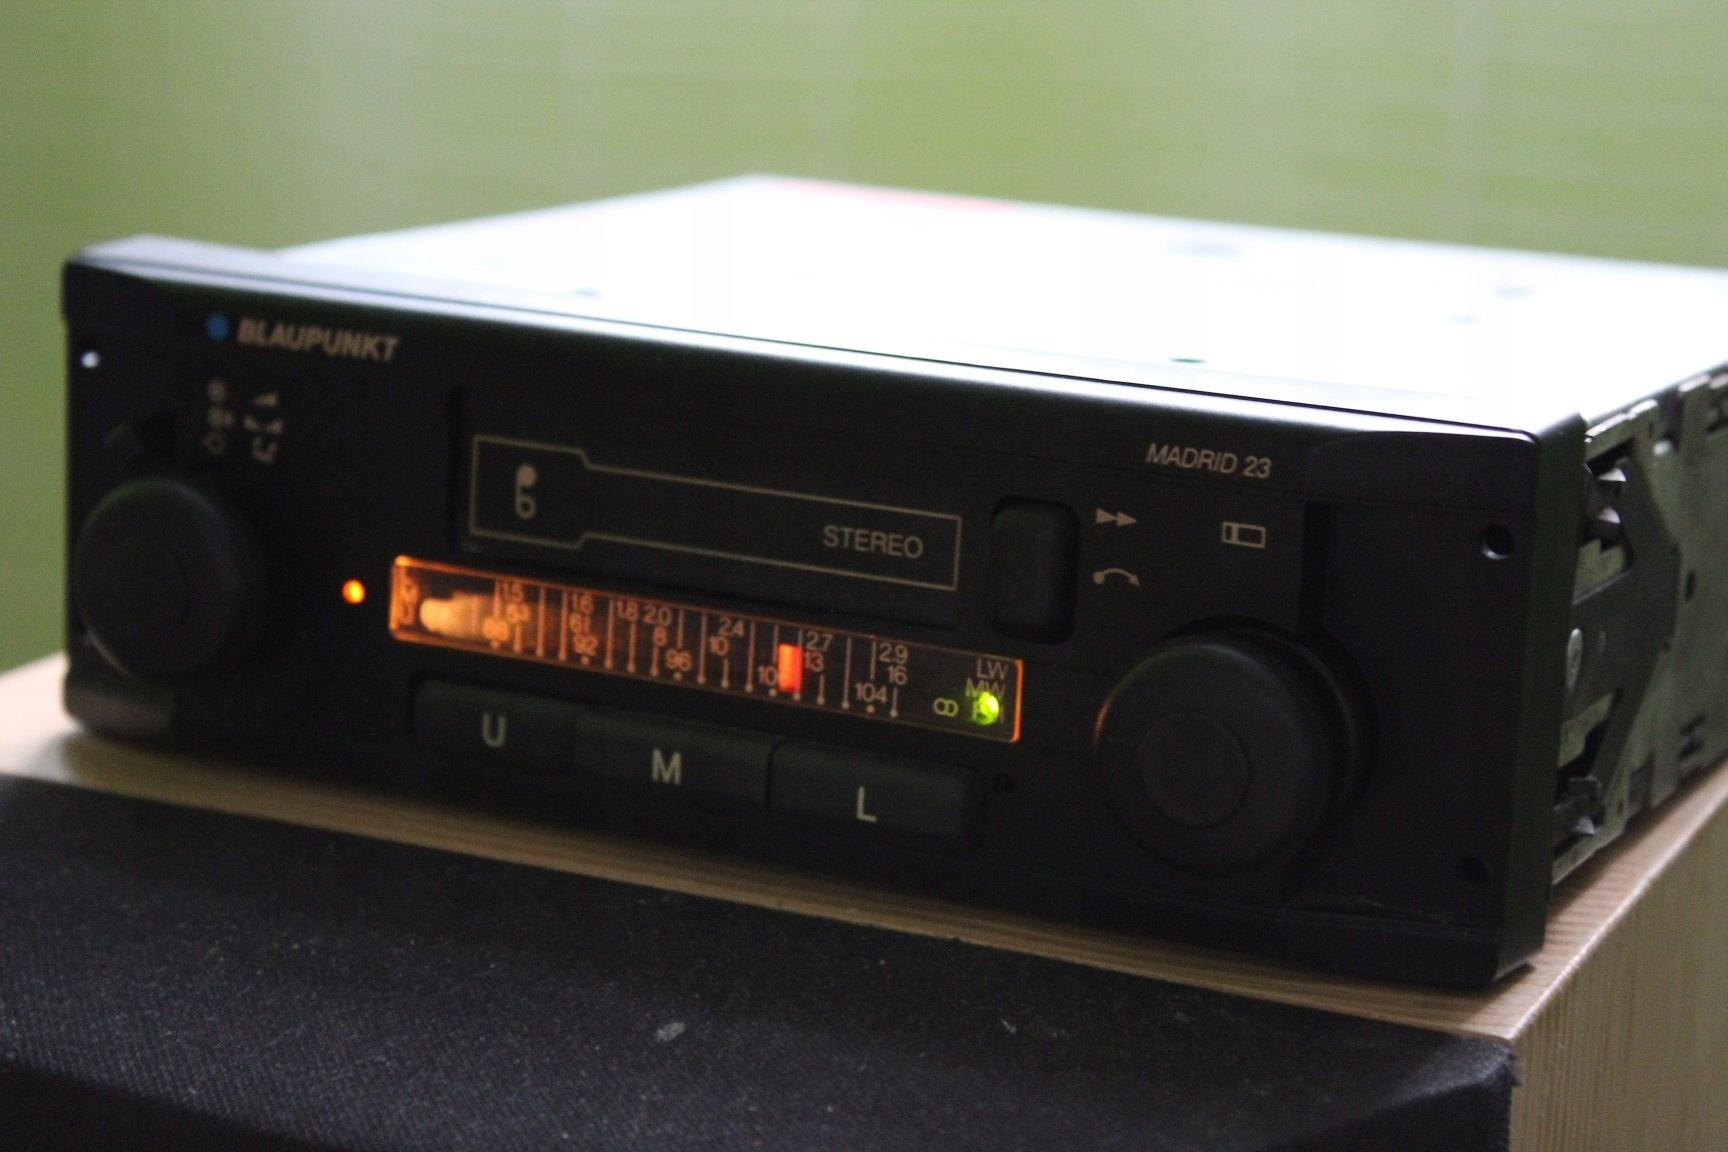 Stare radio samochodowe BLAUPUNKT MADRID 23